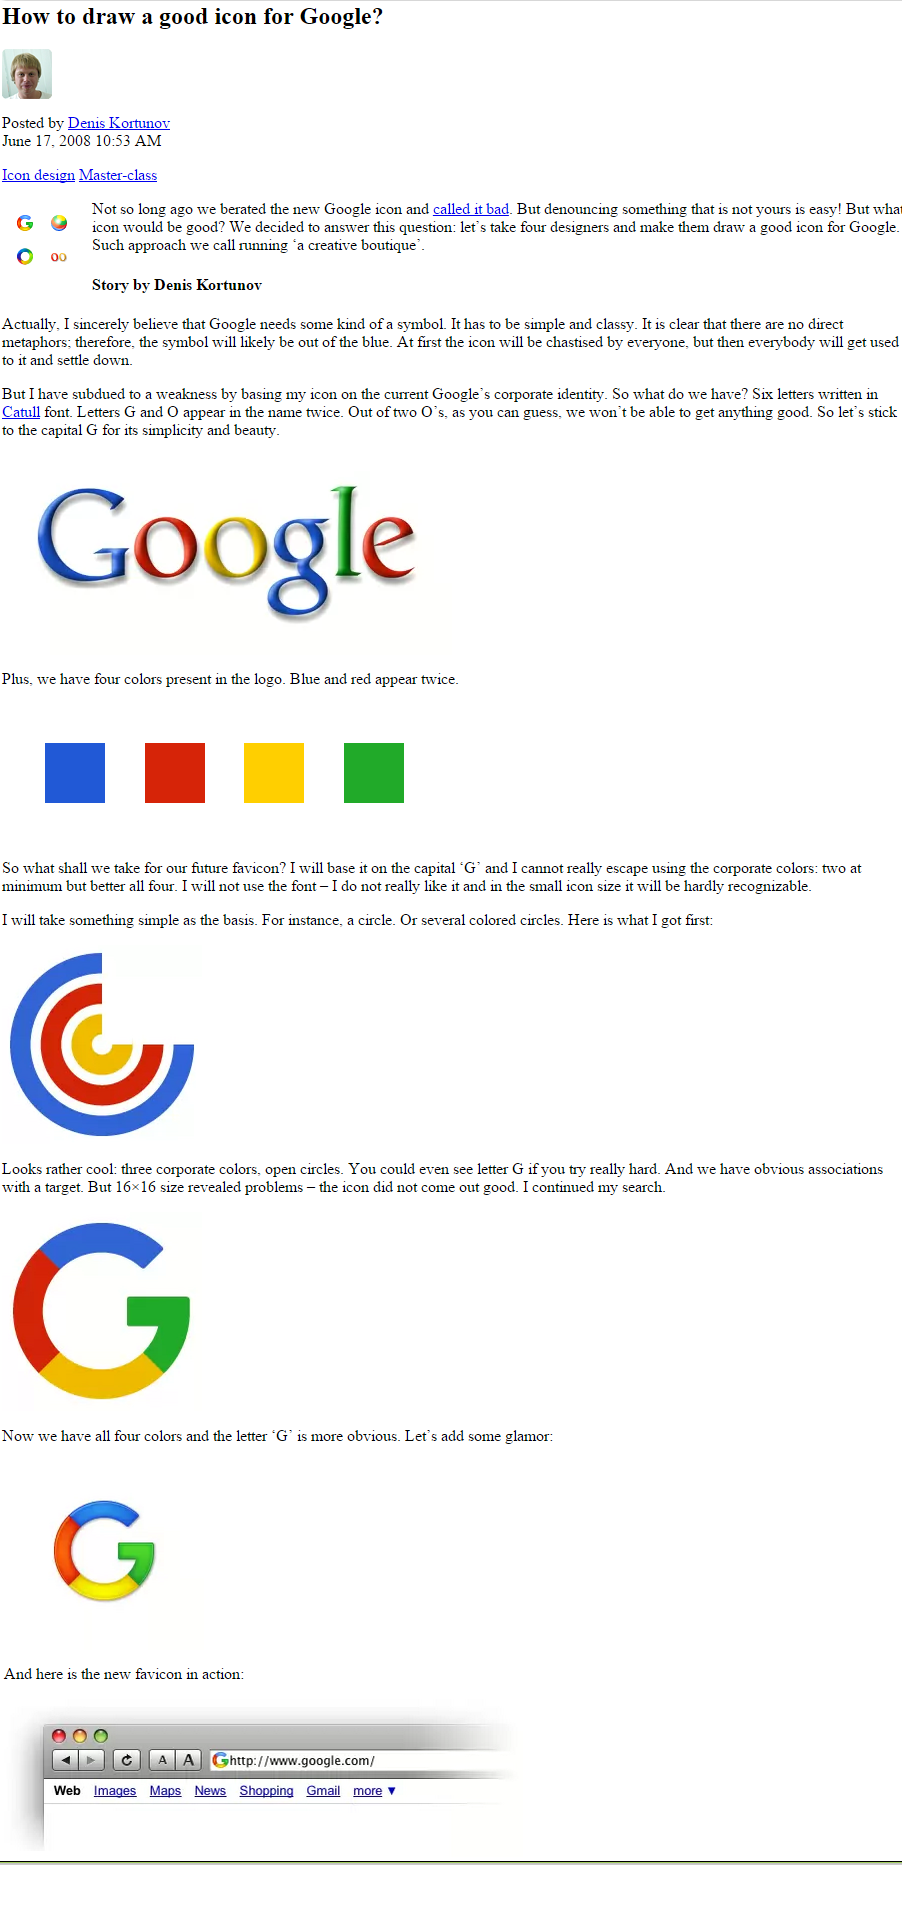 Google_Icon_Redesign_2008_Denis_Kortunov_Screenshot_Wide